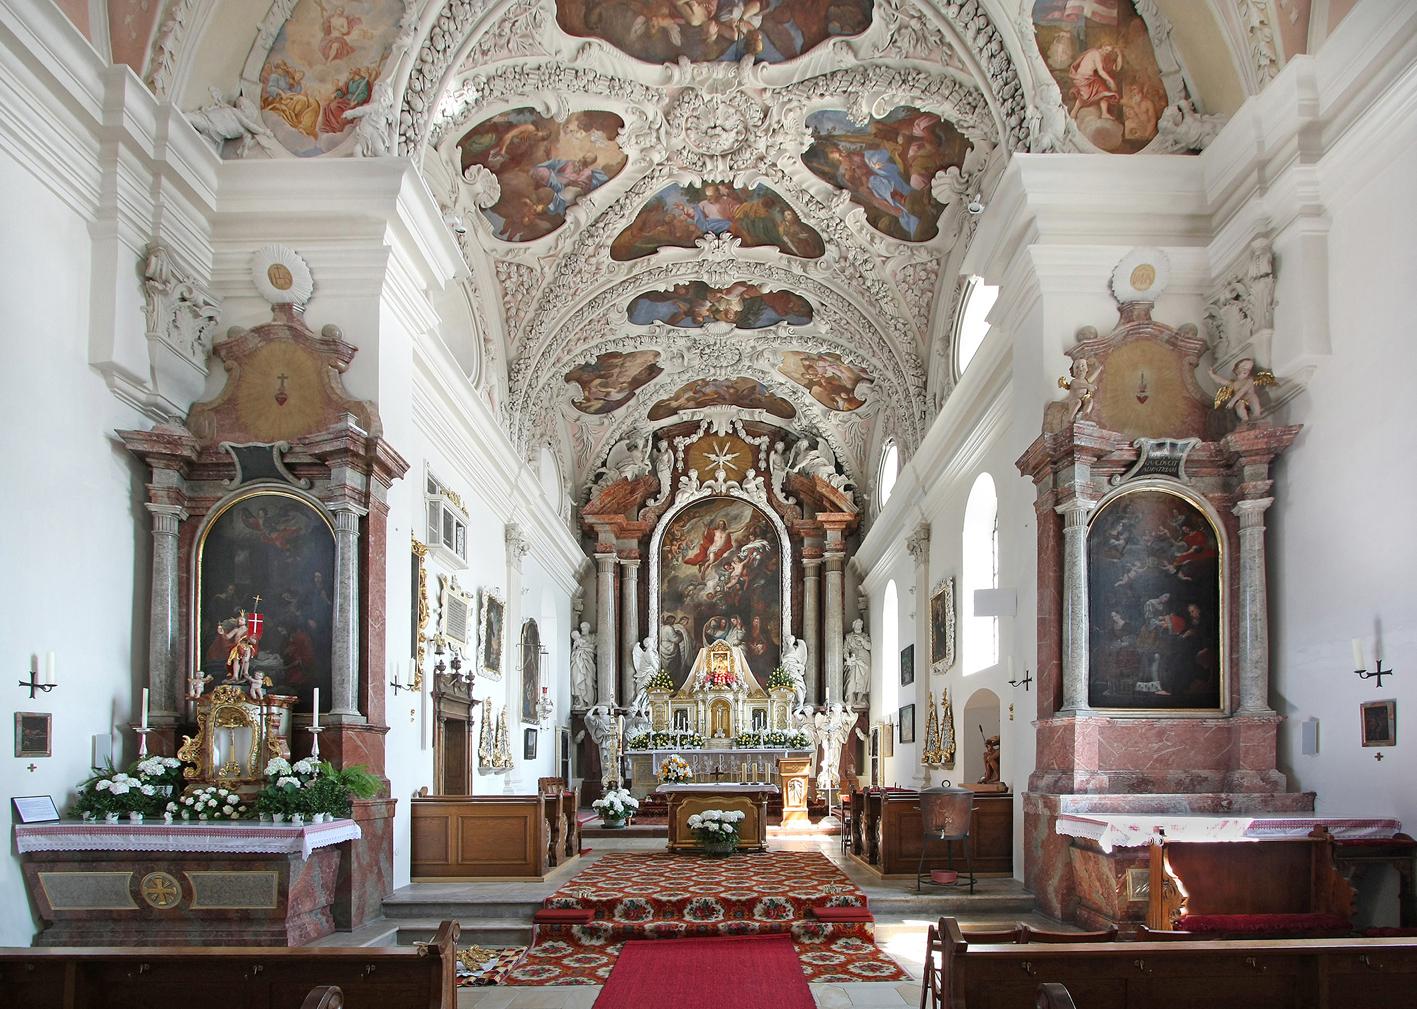 2021 07 21 aoelfb wallfahrtskirche gartlberg1